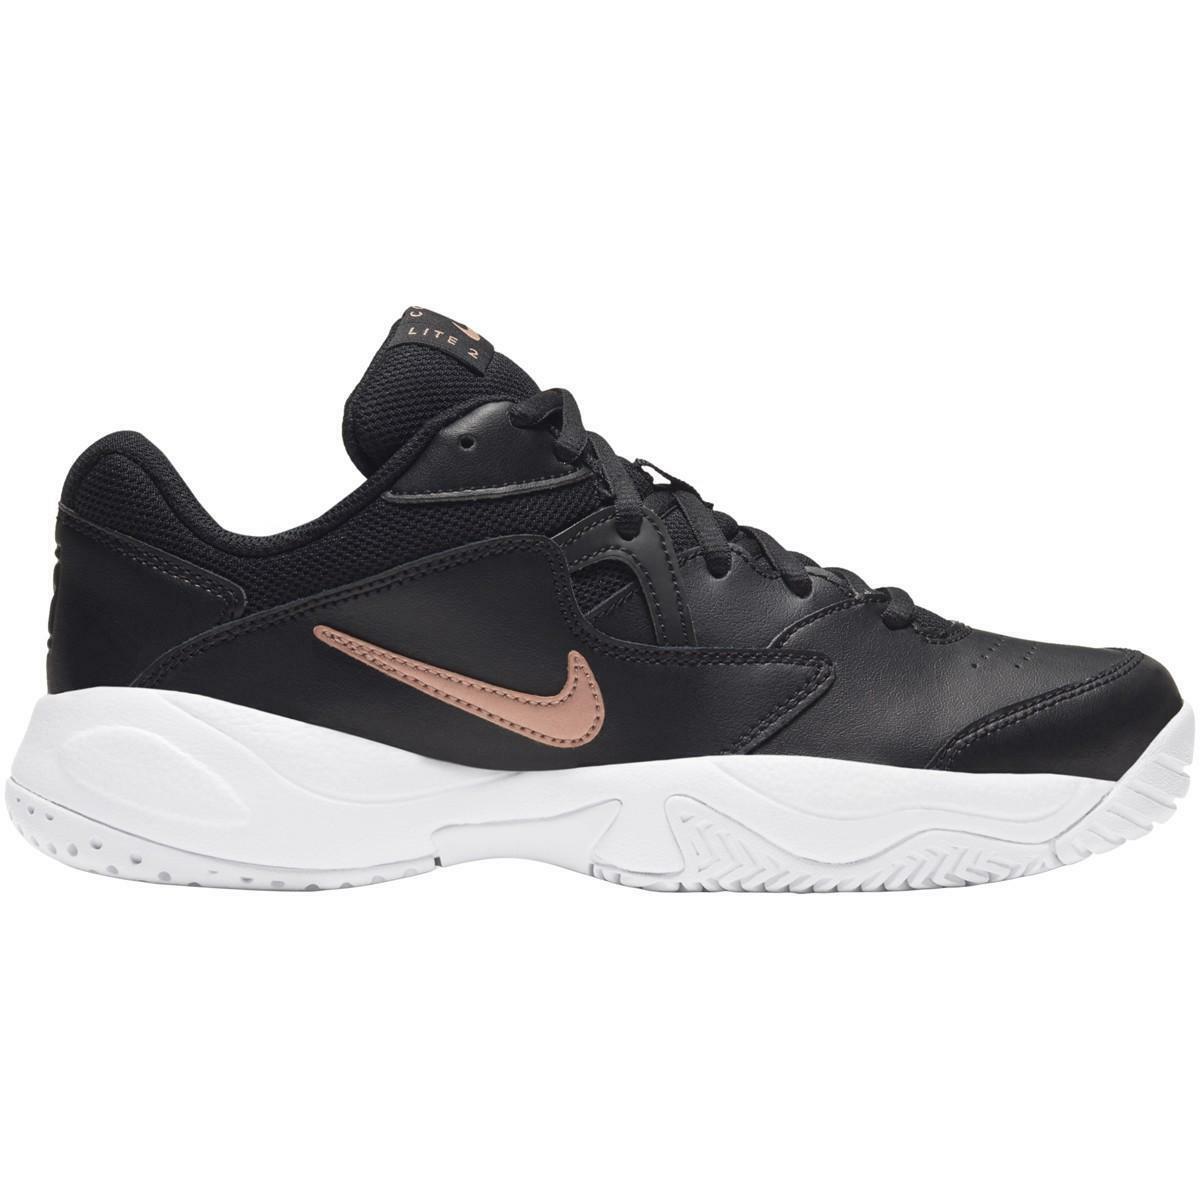 nike nike court lite 2 ar8838 003 scarpa sportiva tennis nero